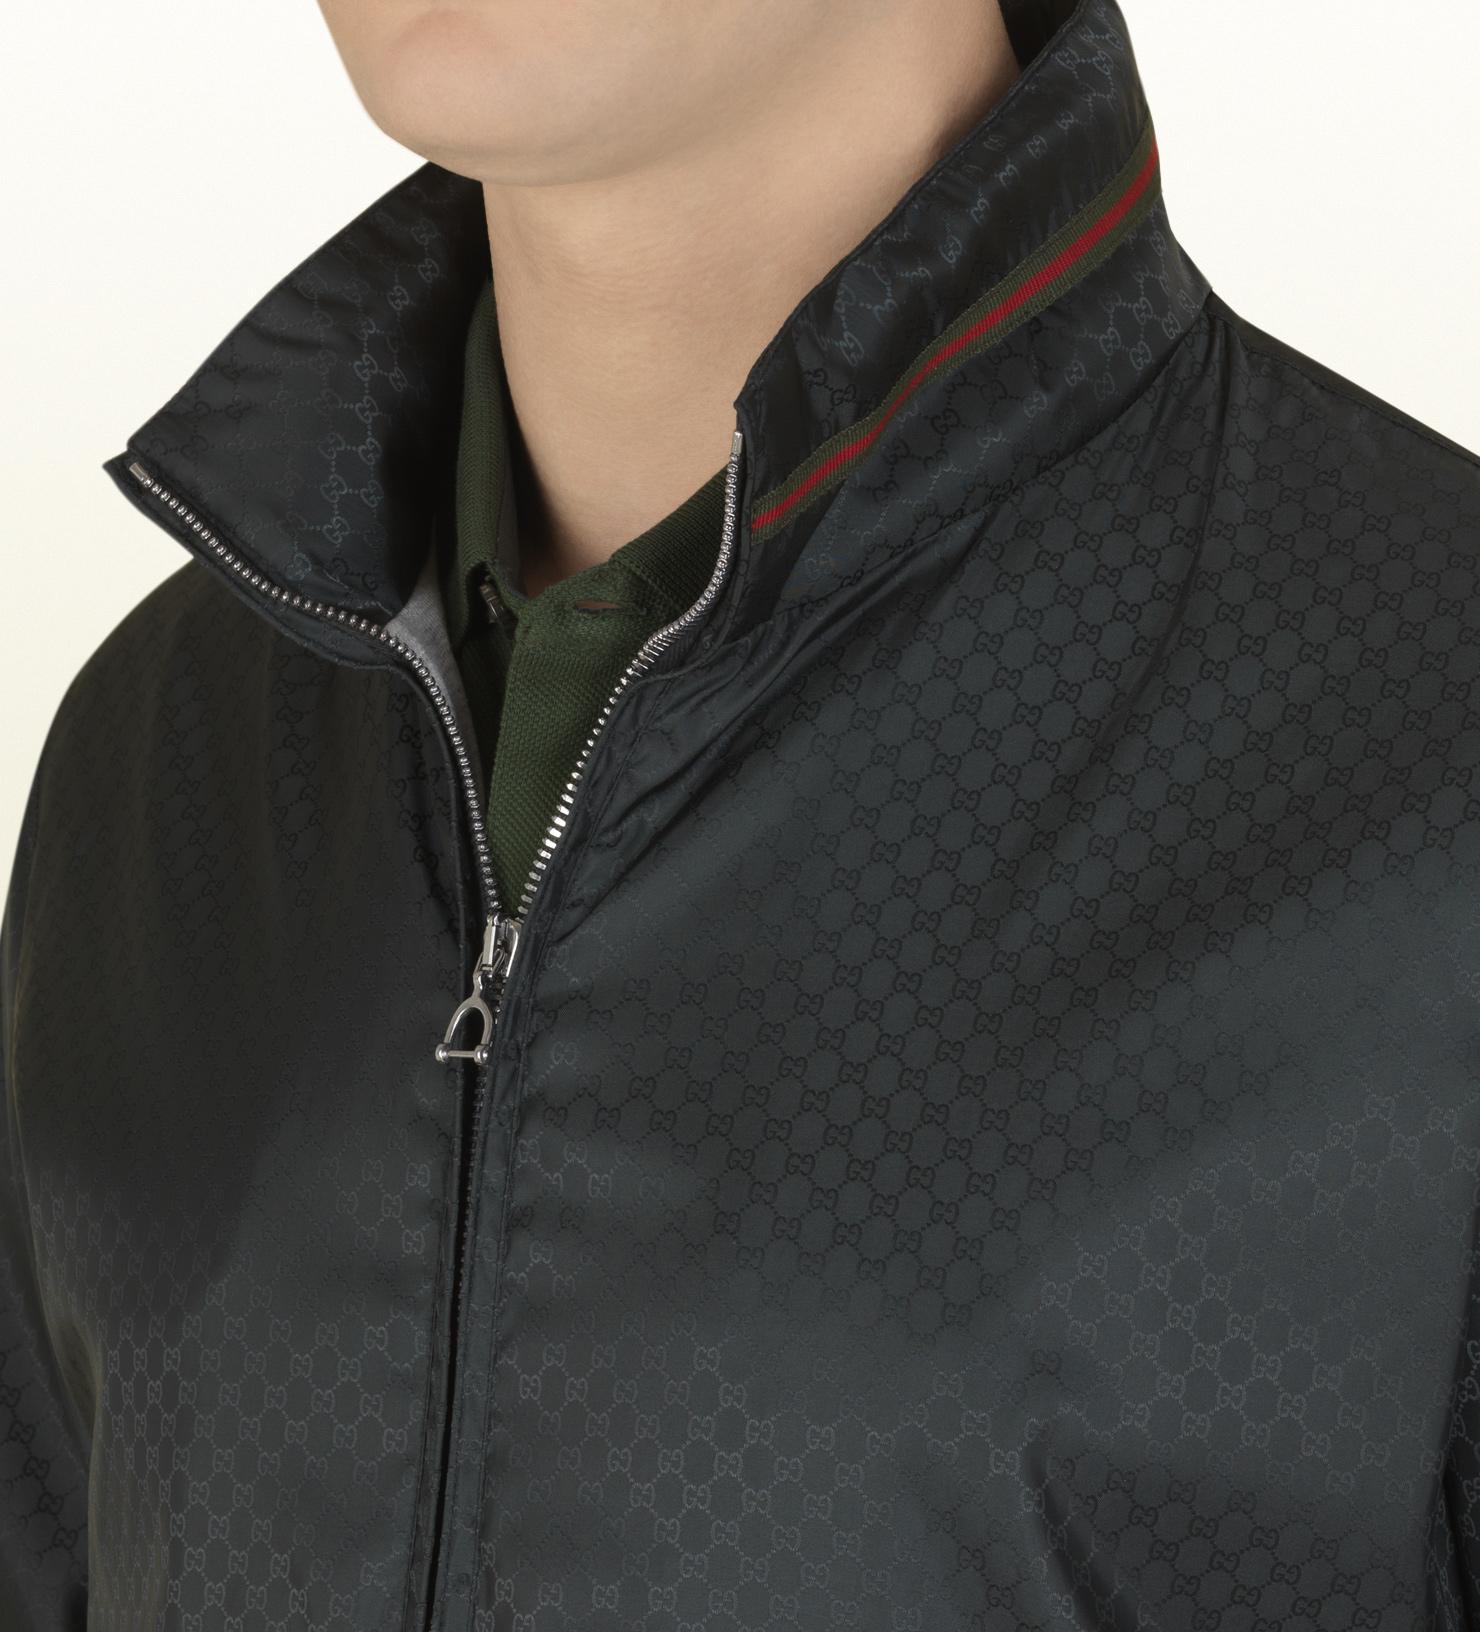 347920413b200 Lyst - Gucci Dark Green Mini Gg Jacquard Nylon Jacket in Black for Men